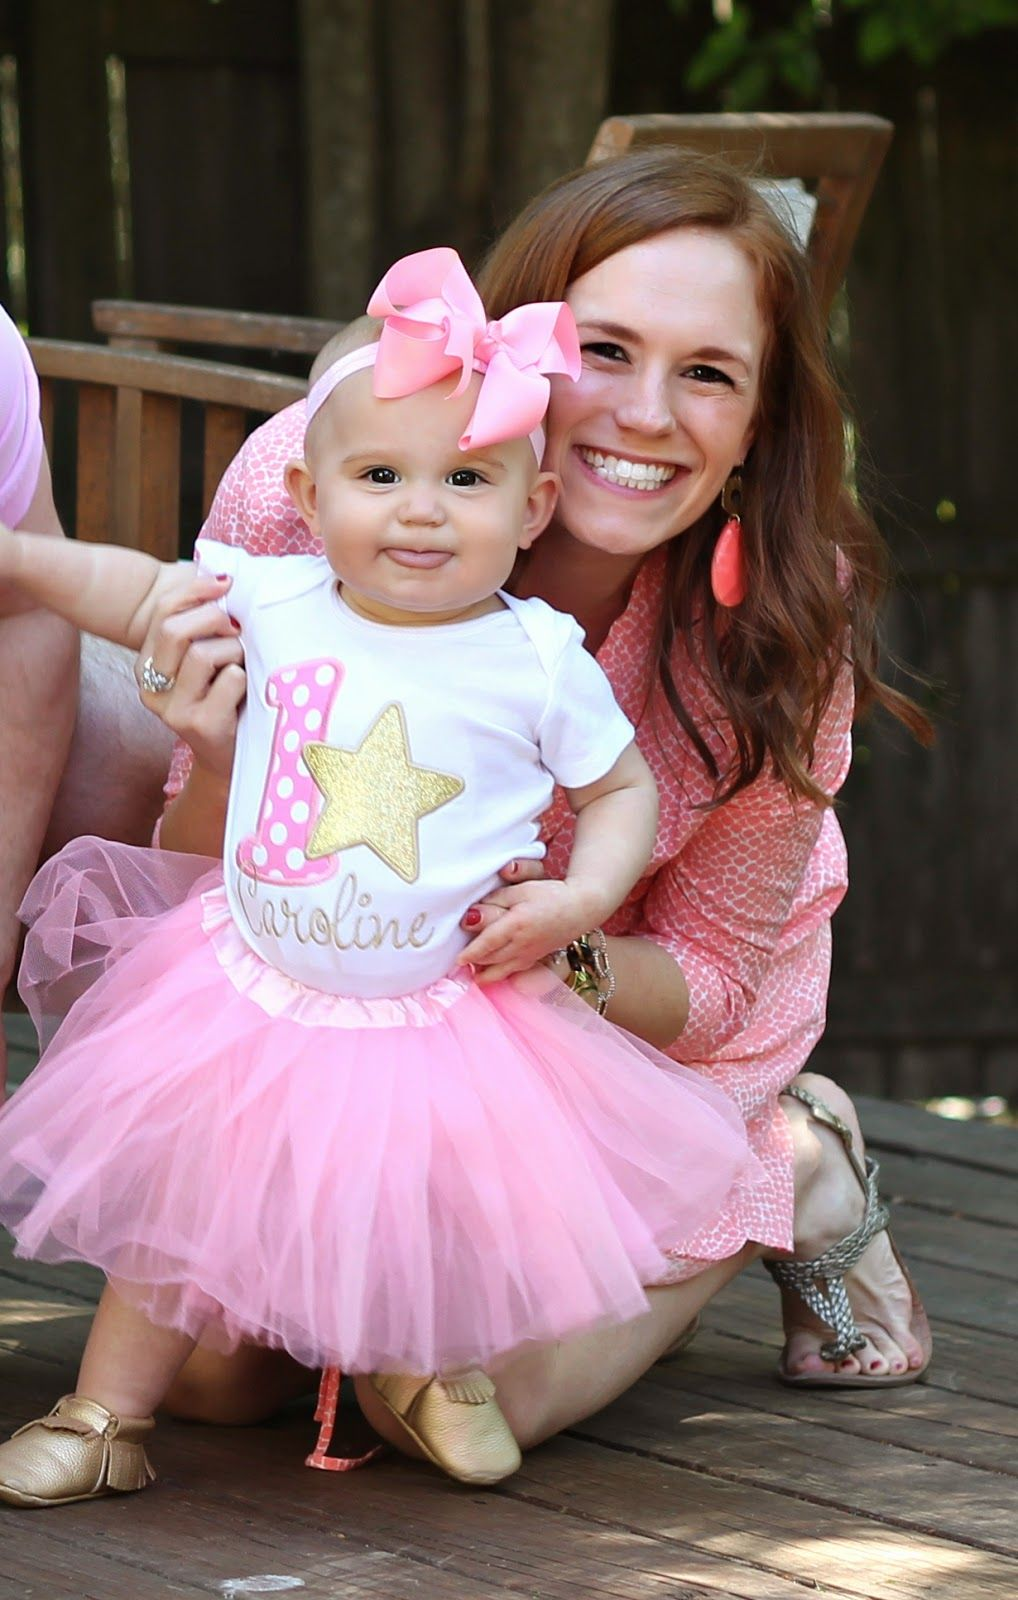 A super sweet Twinkle Twinkle Little Star first birthday